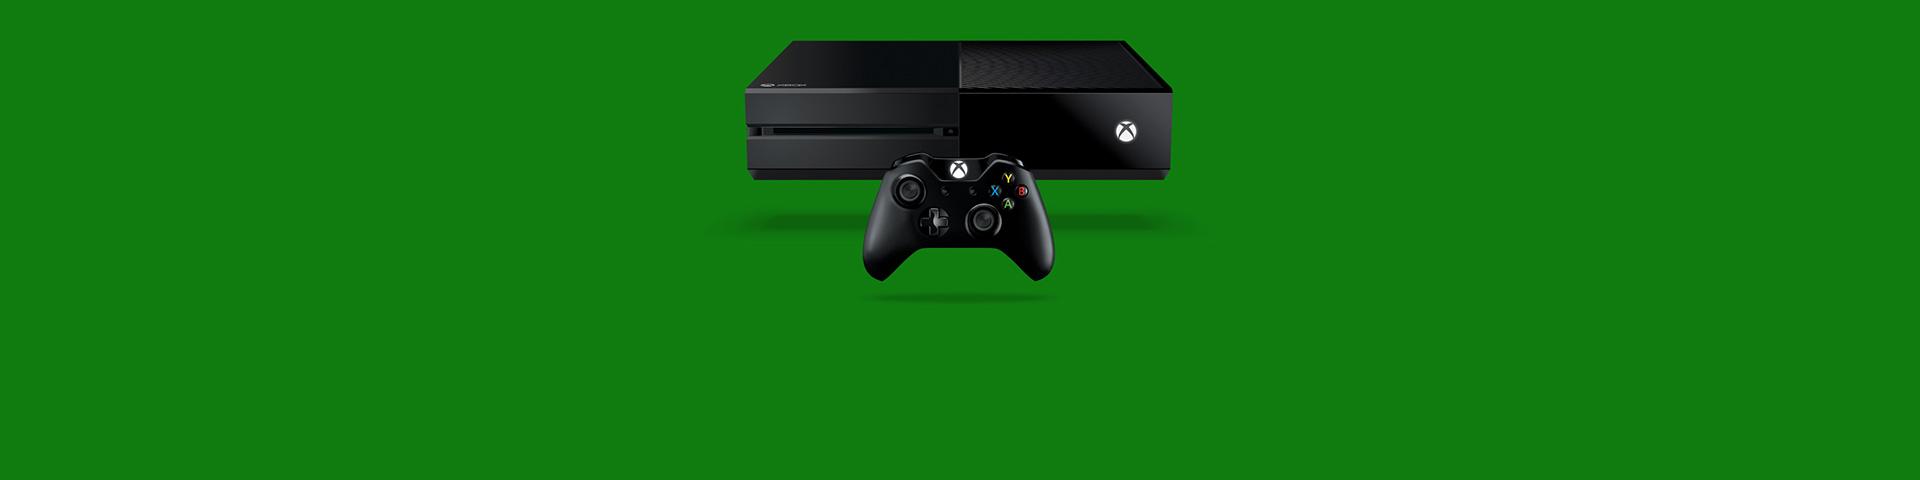 Xbox One 主機與控制器;選購全新 Xbox One 主機